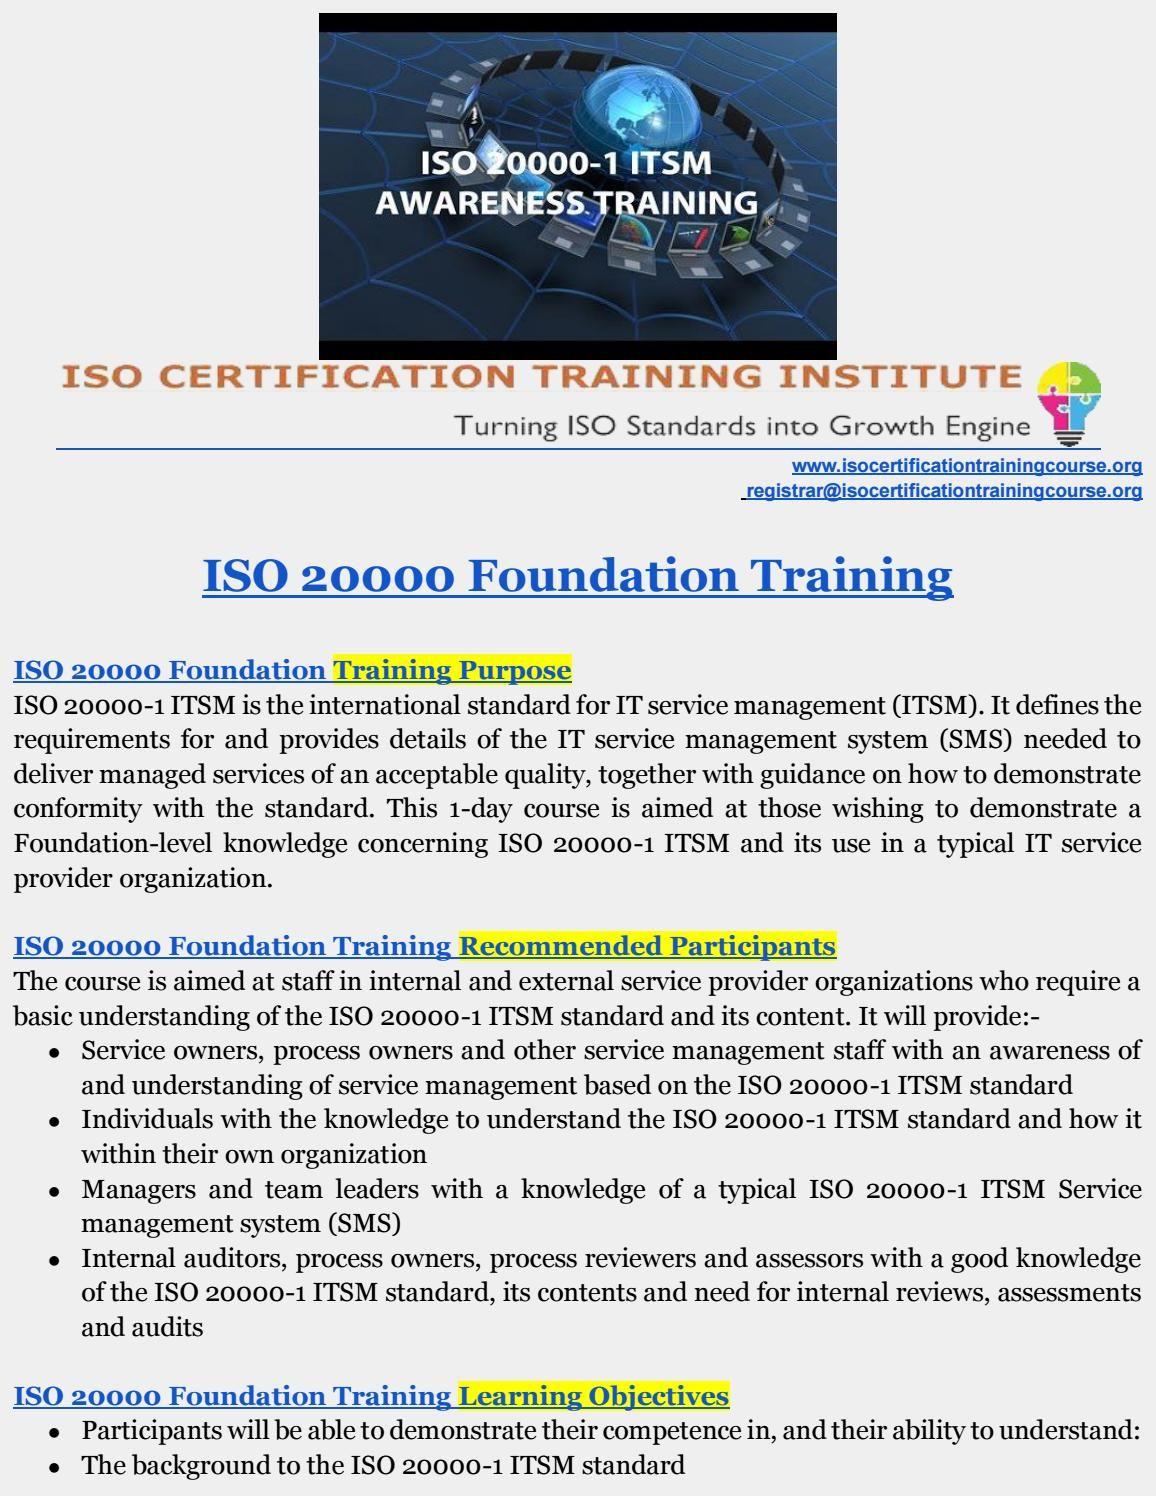 Itsm Training Iso Training Institute Pinterest Foundation And